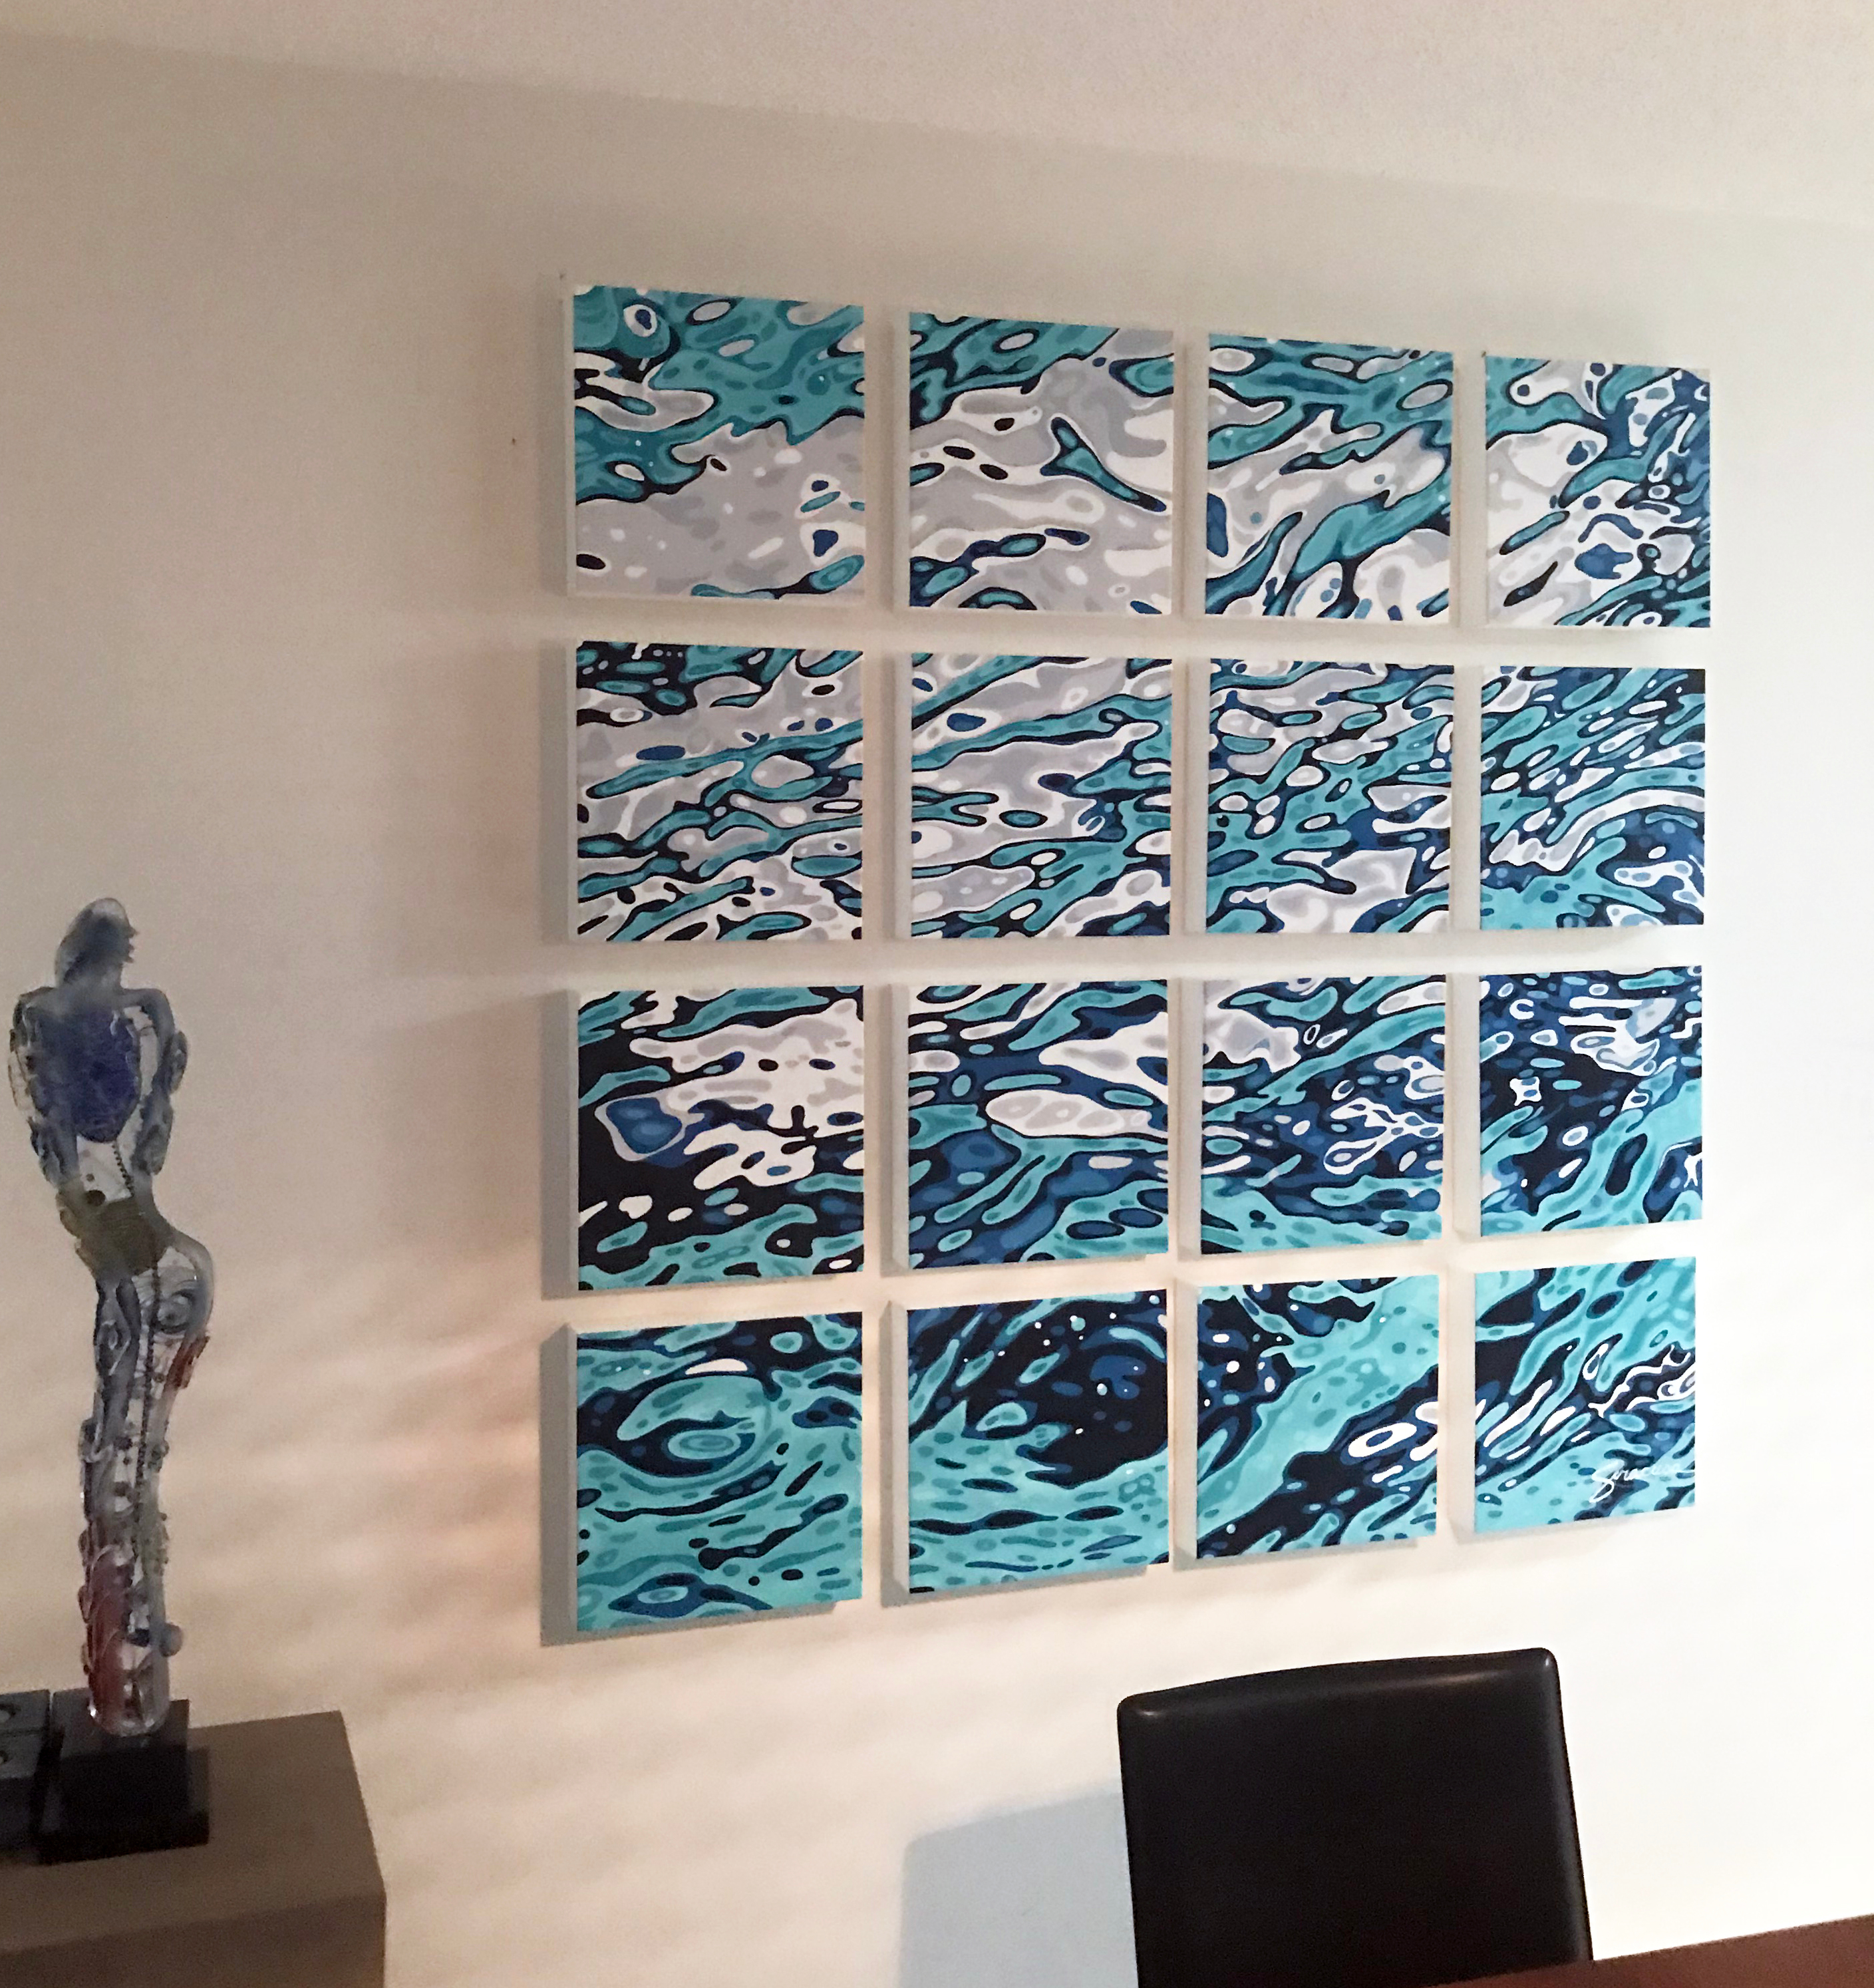 Siracusa   aqua marine   installed aq3udy